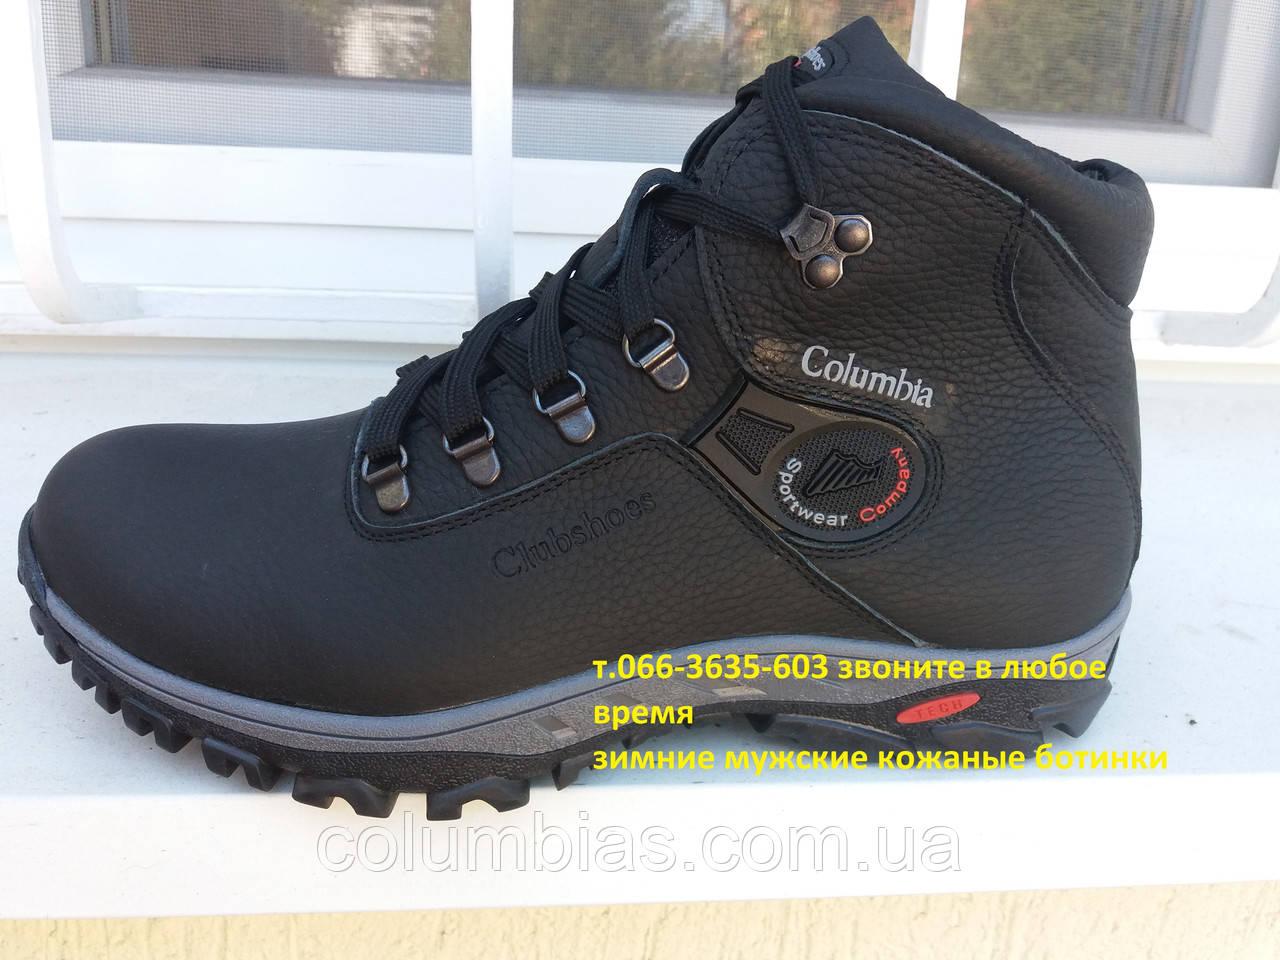 1433f7a3 Акция! Зимние ботинки Collumbia - Весь ассортимент в наличии, звоните в  любое время т